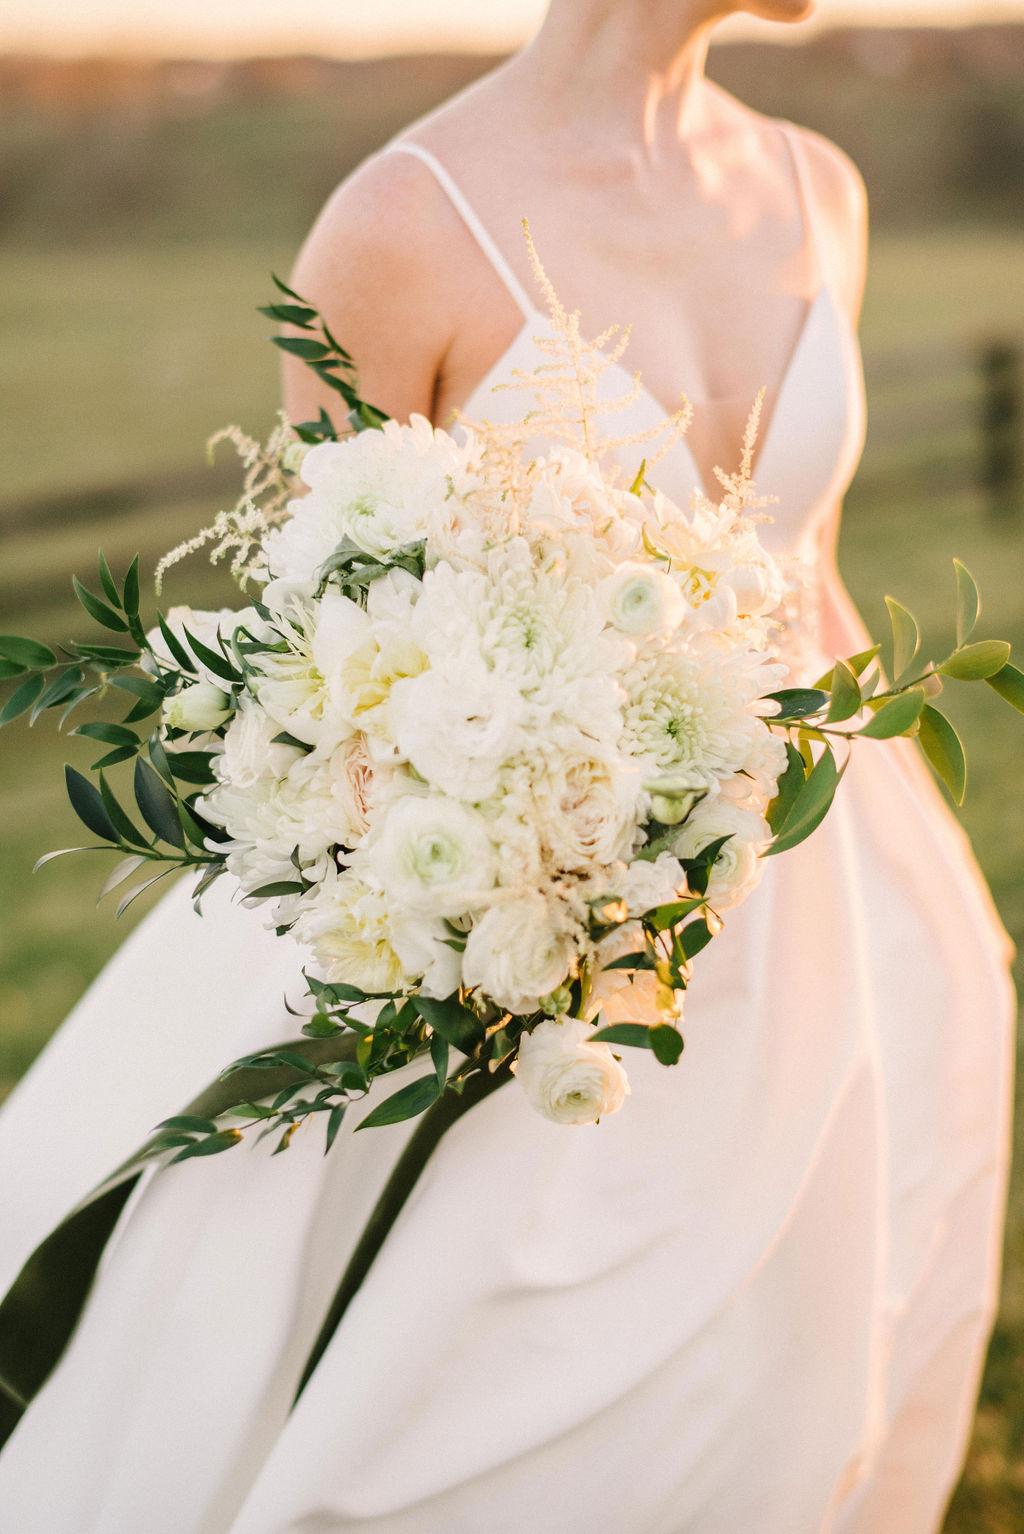 brielle-davis-events-shadow-creek-wedding-annie-david-bridal-boquet.jpg